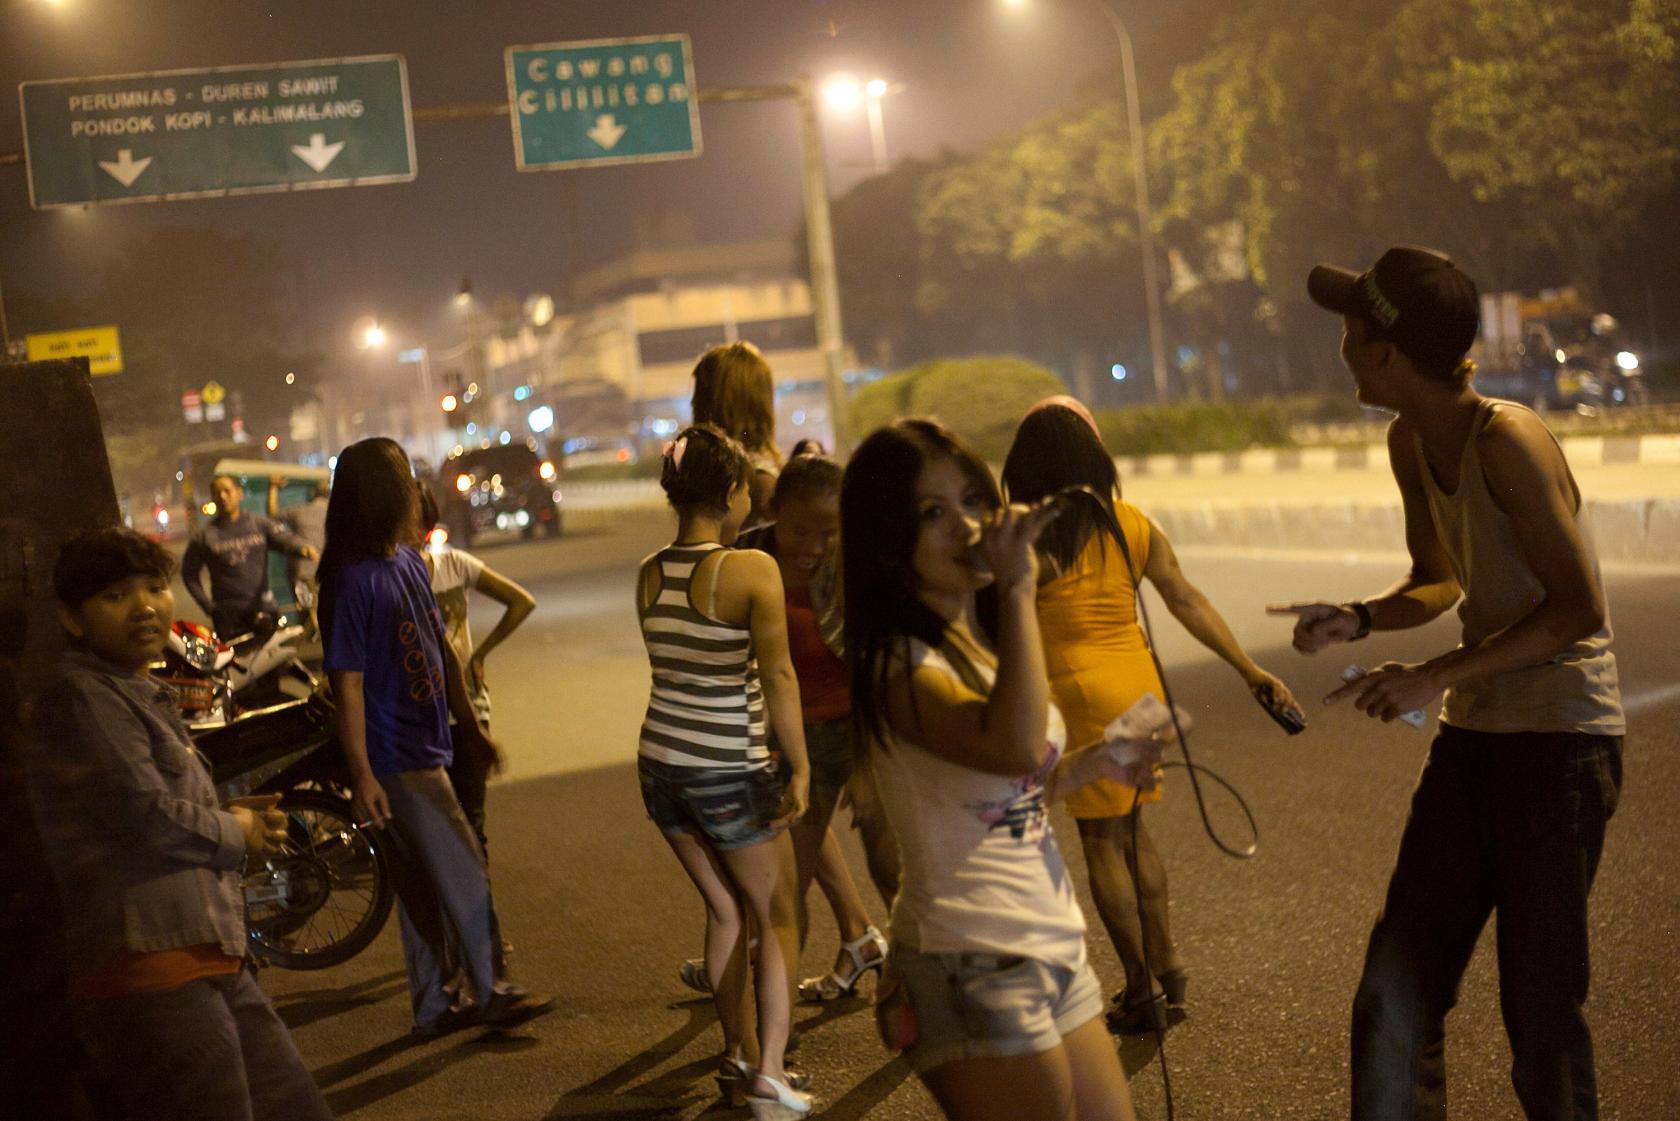 prostitutas en mollet del valles camp nou prostitutas